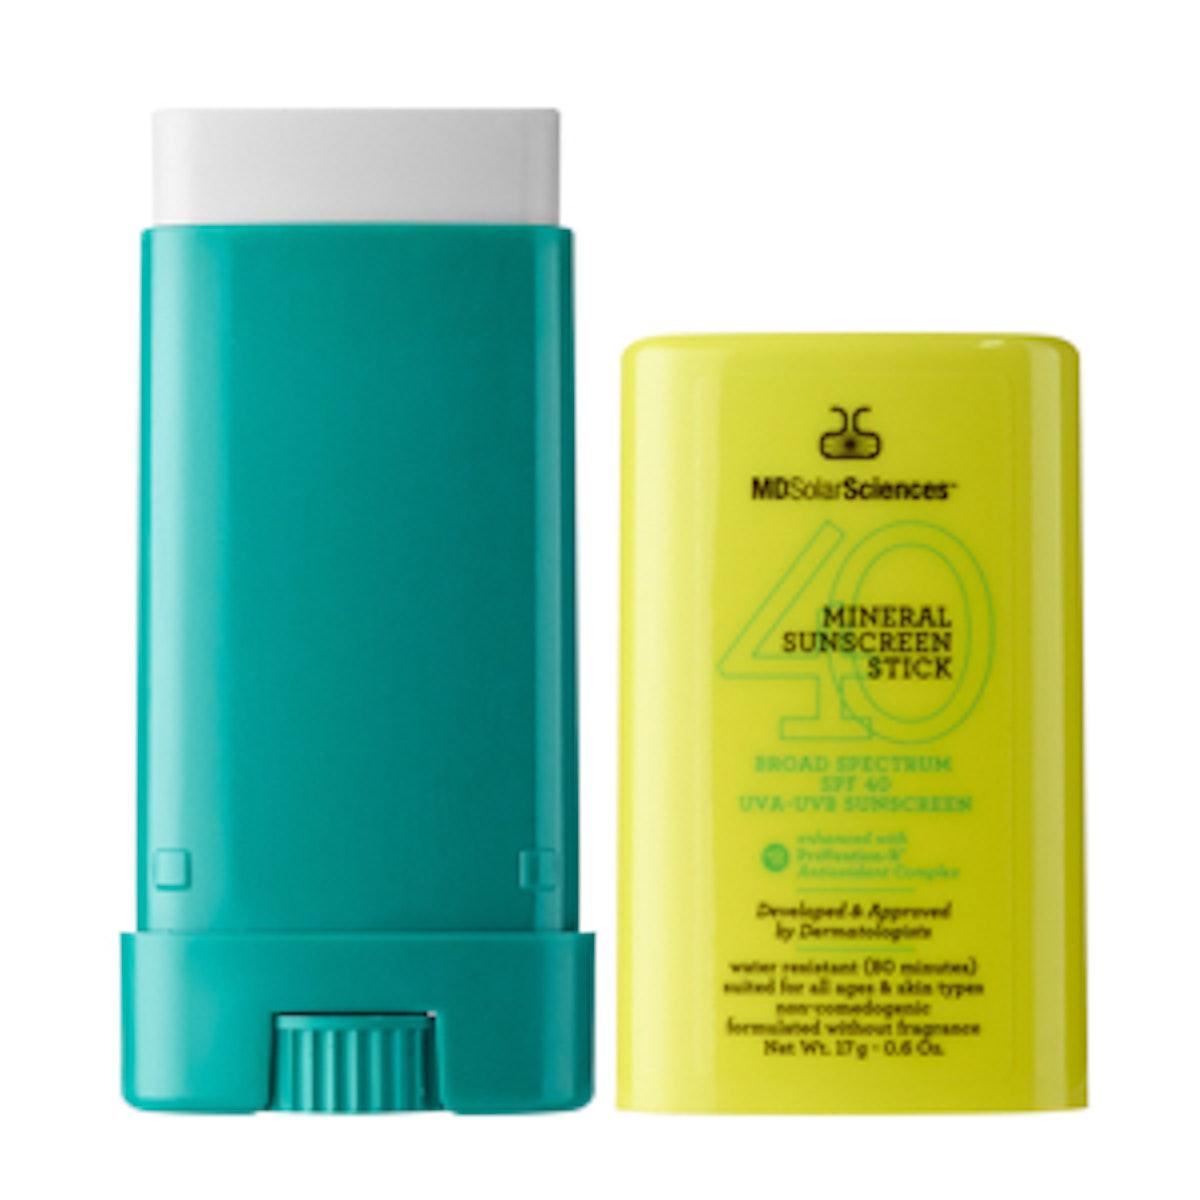 Mineral Sunscreen Stick Broad Spectrum SPF 40